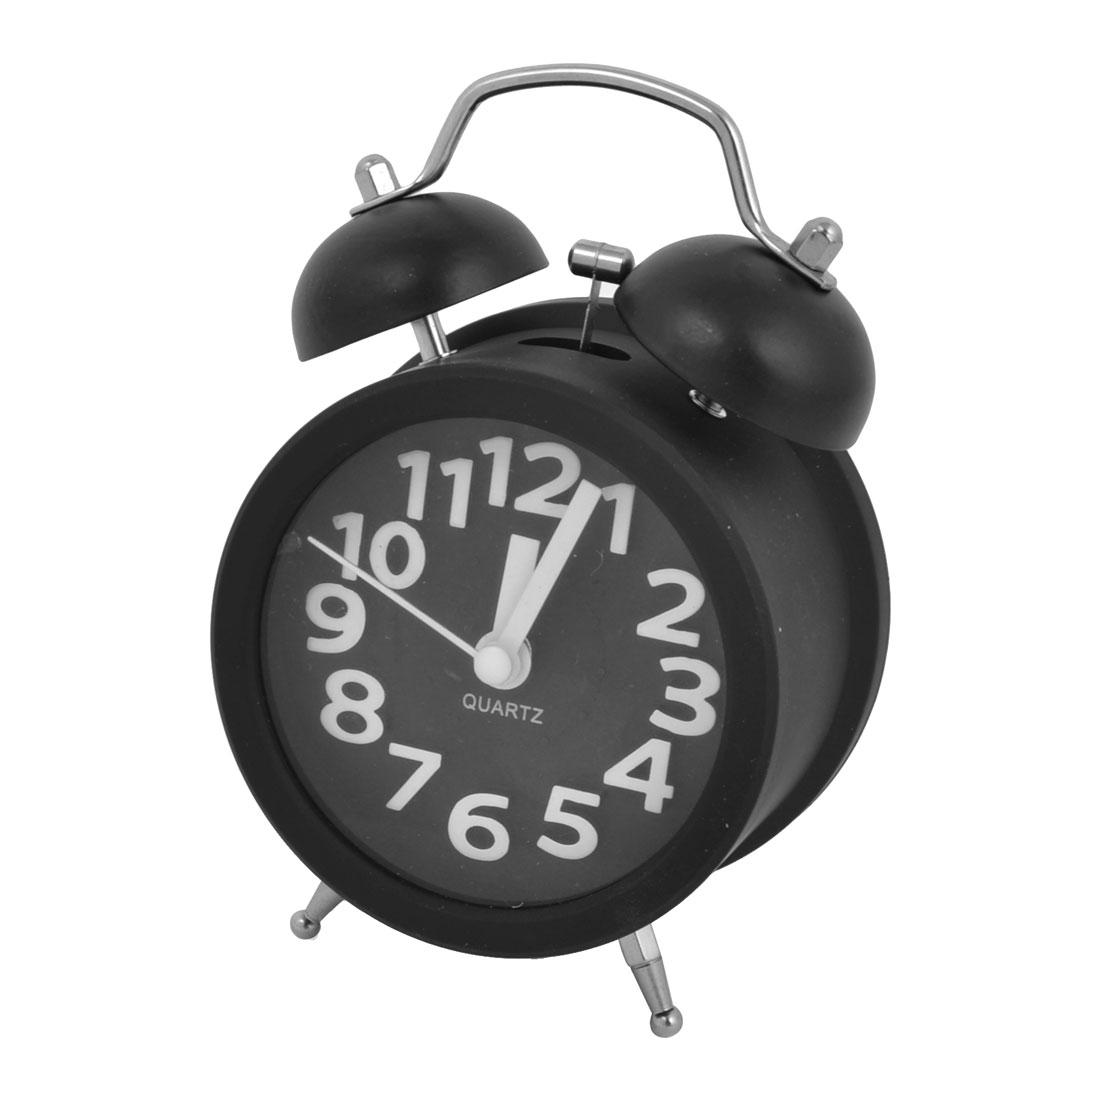 Black Round Metal Battery Powered Night Light 2 Hammer Bells Desk Alarm Clock